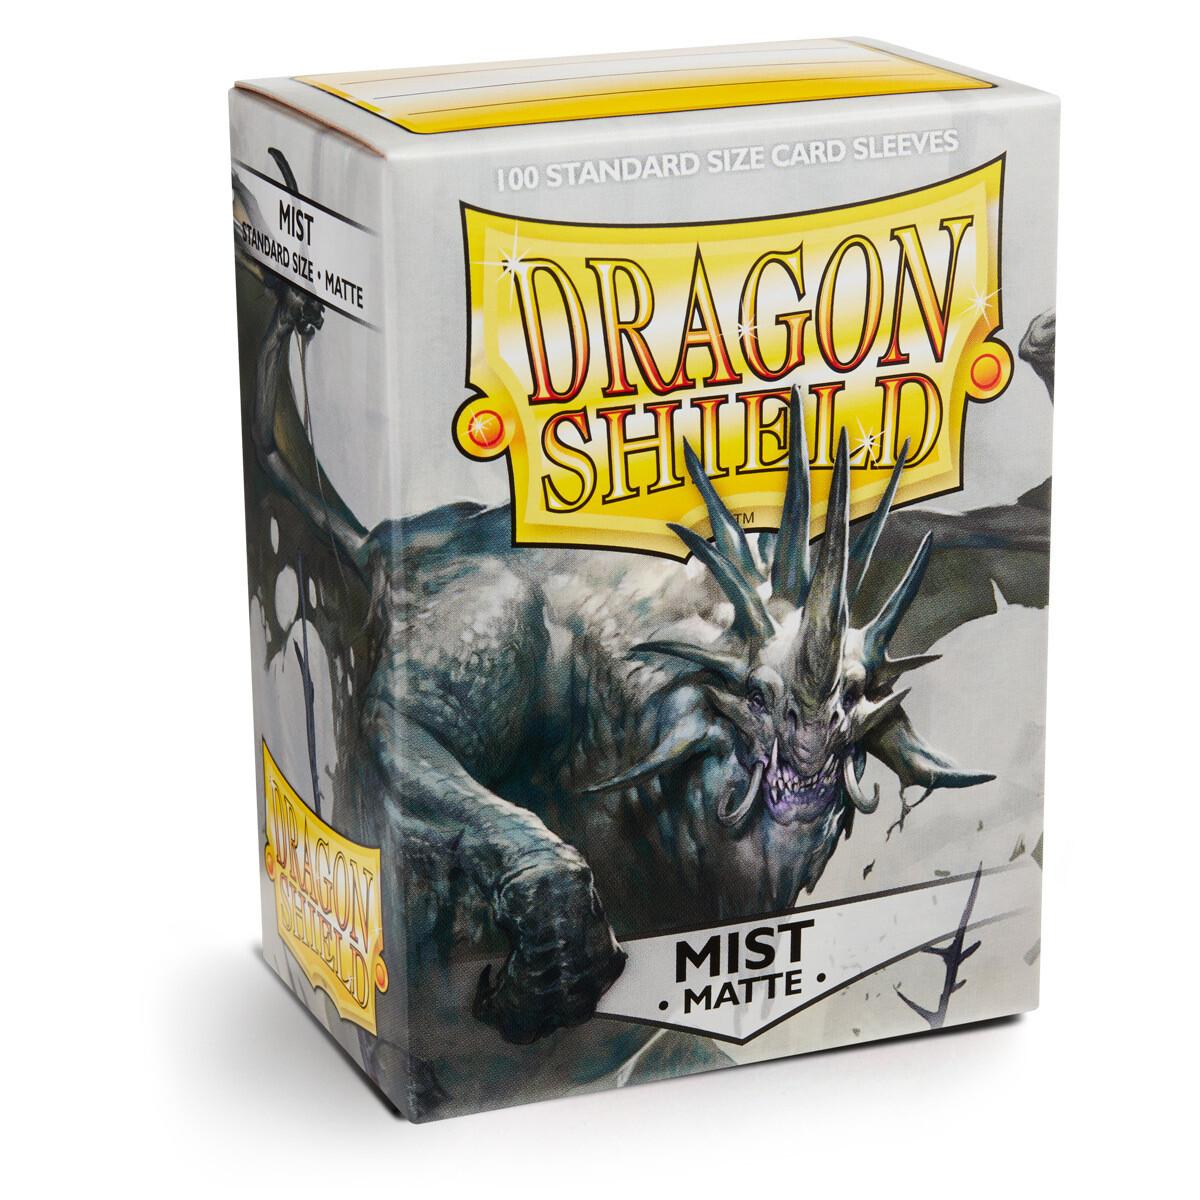 Dragon Shield 100 Sleeves - Matte Mist